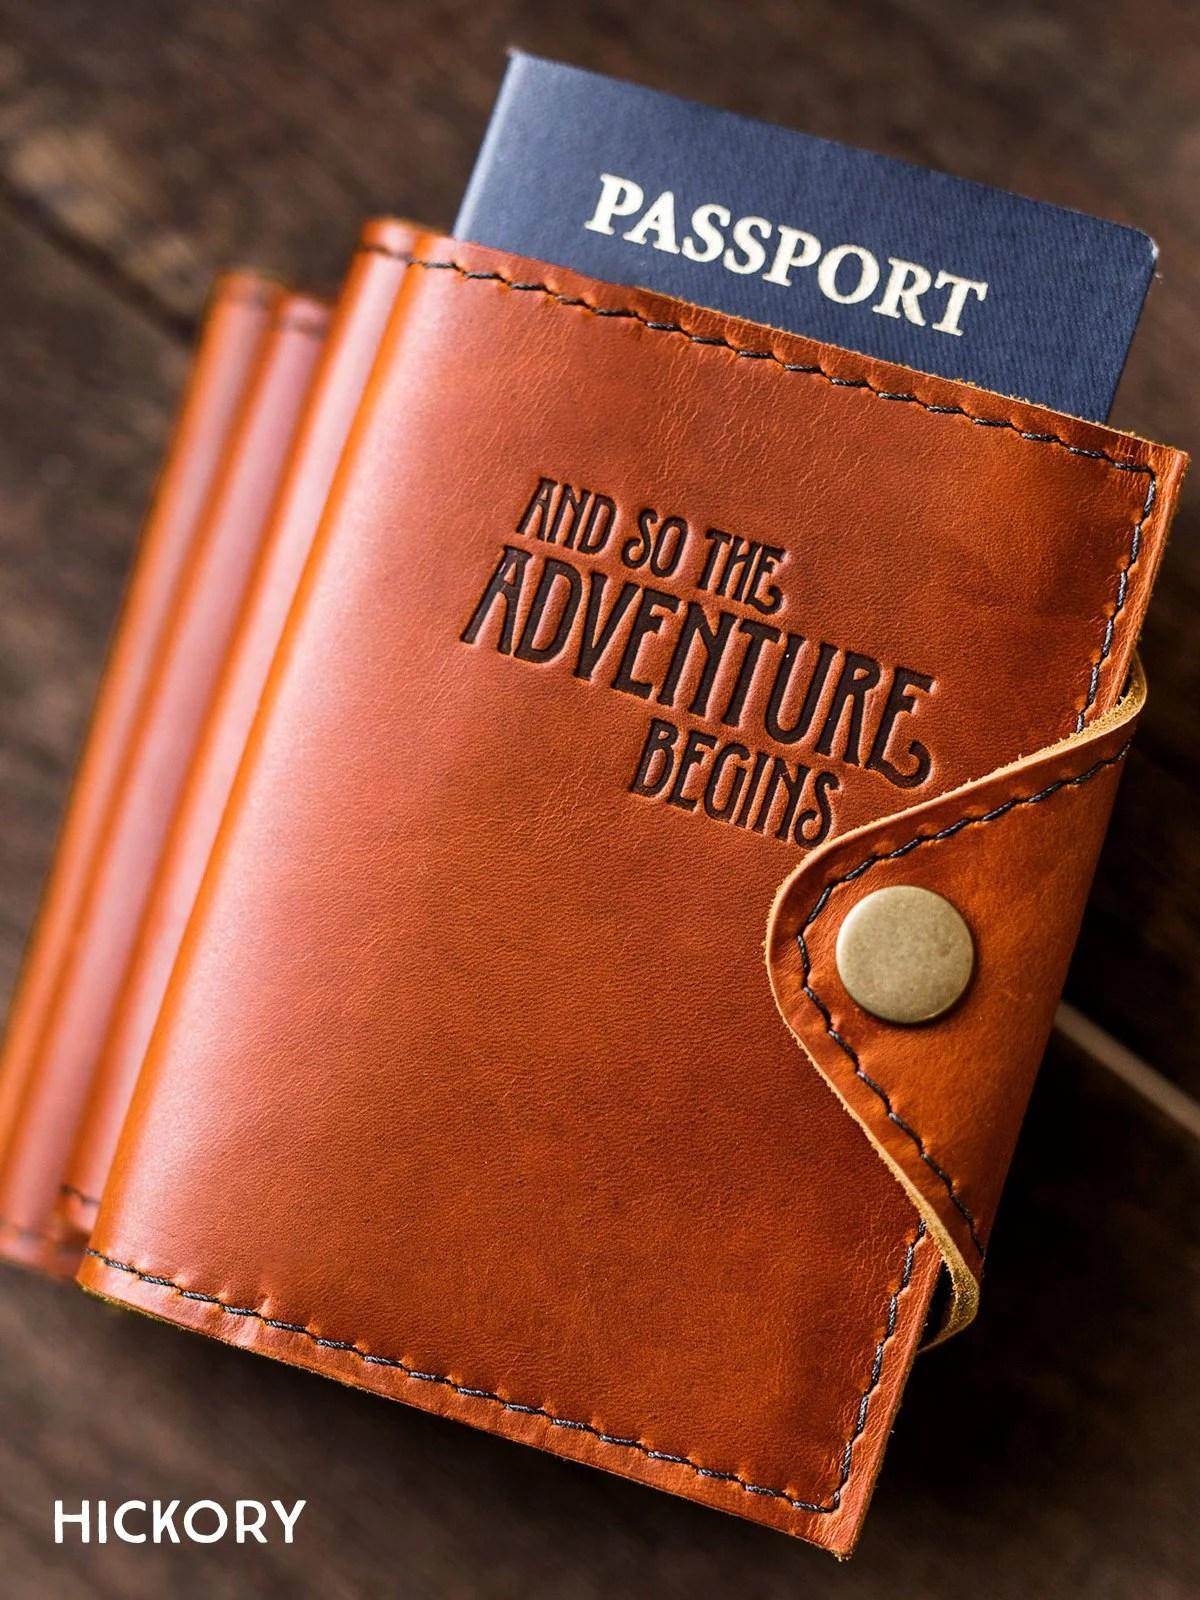 Passport Cover Travel Passport Personalized Cover... Custom image 1